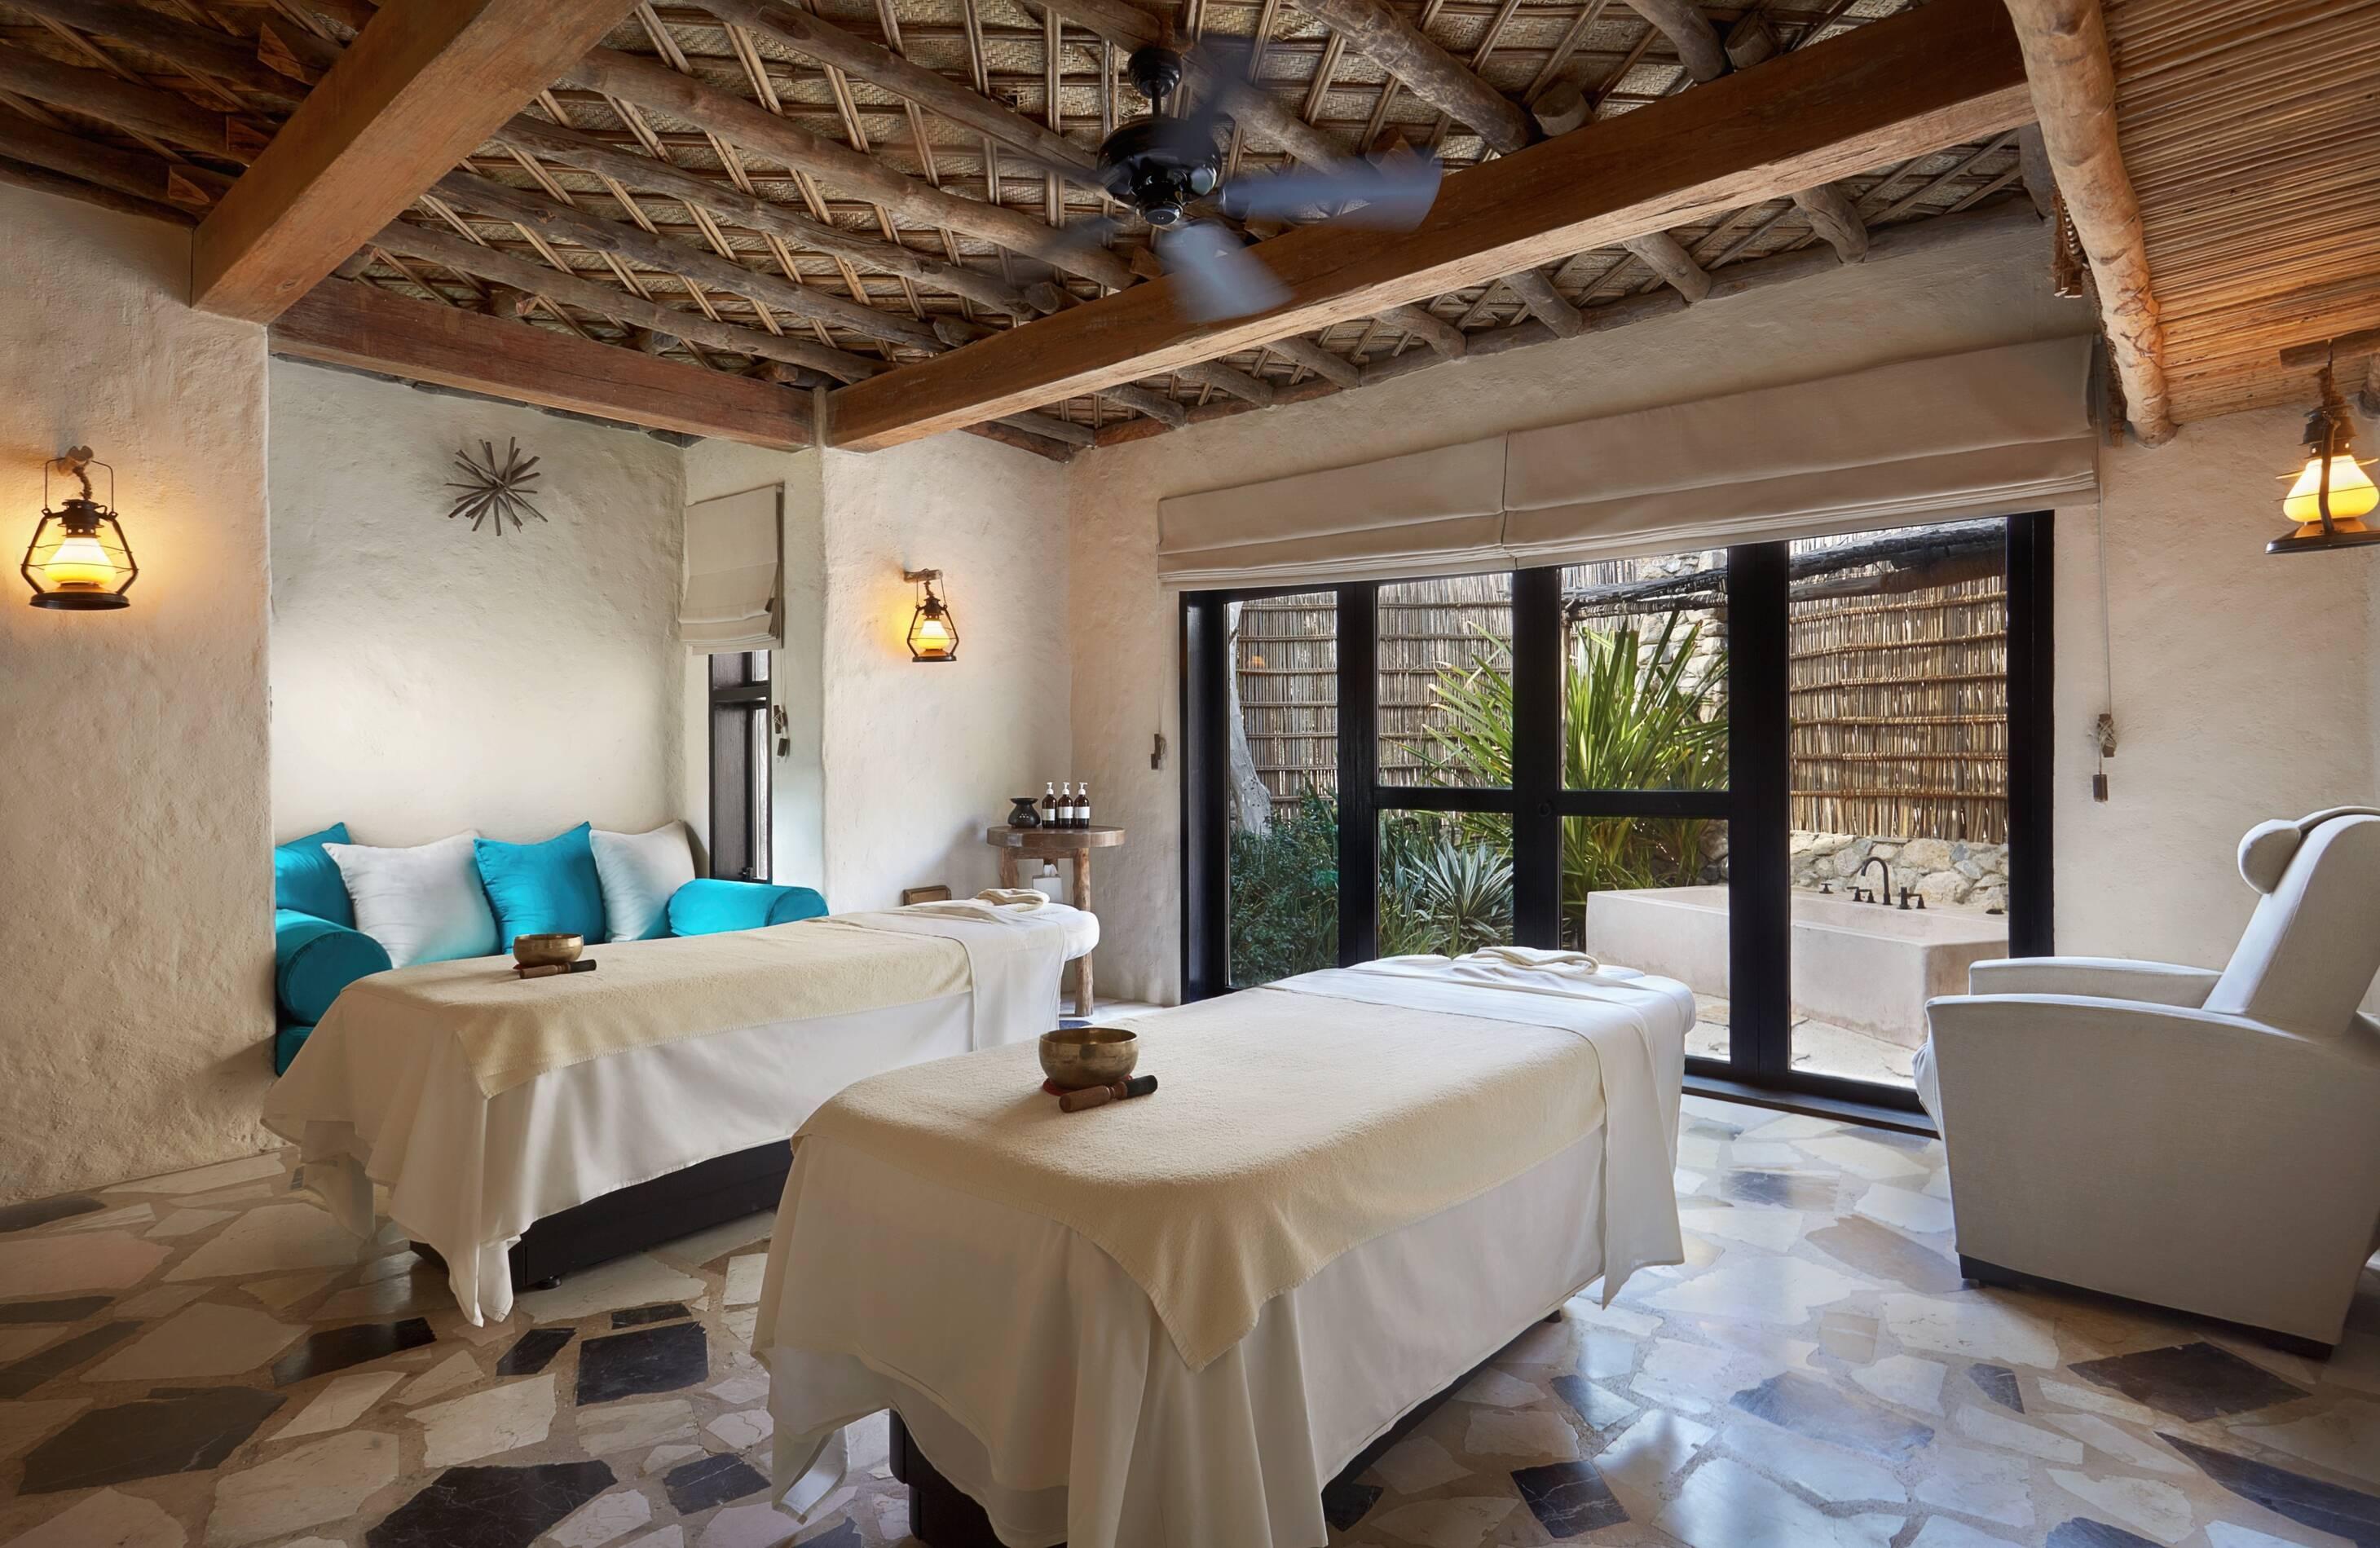 Six Senses Zighy Bay Spa Oman